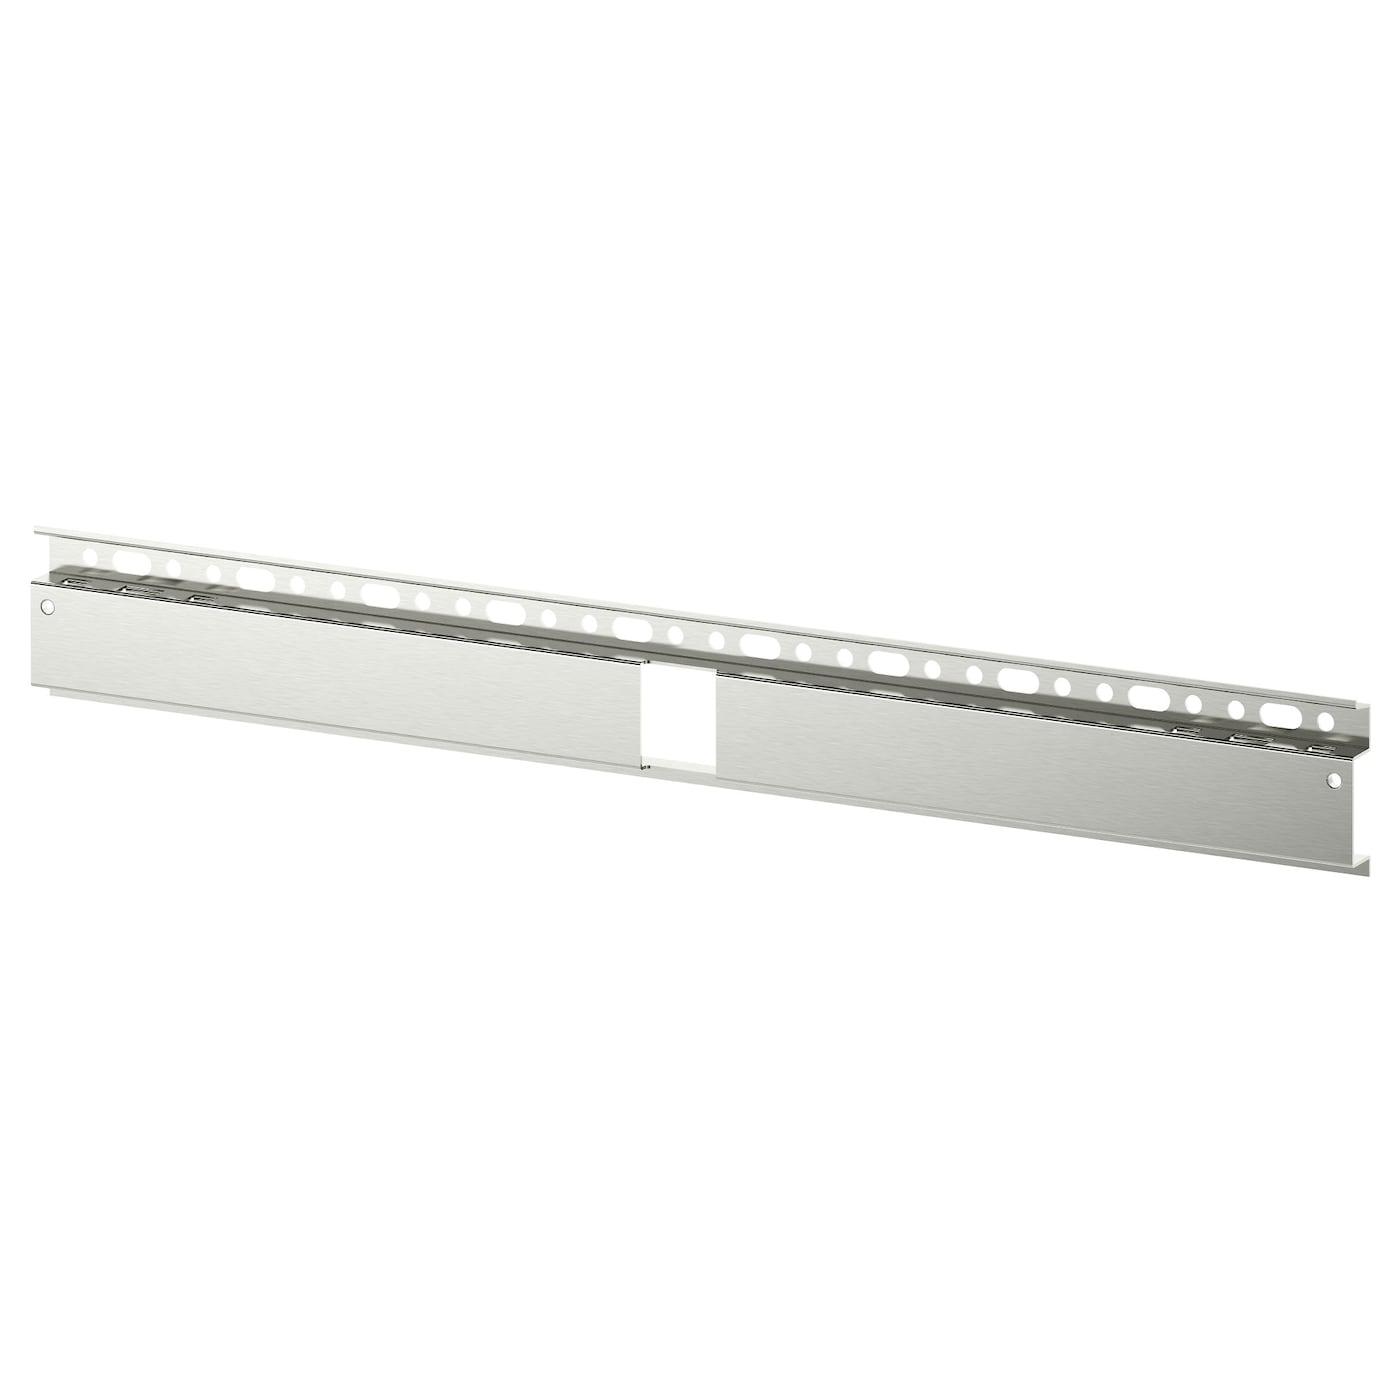 BESTÅ Suspension rail, silver-colour